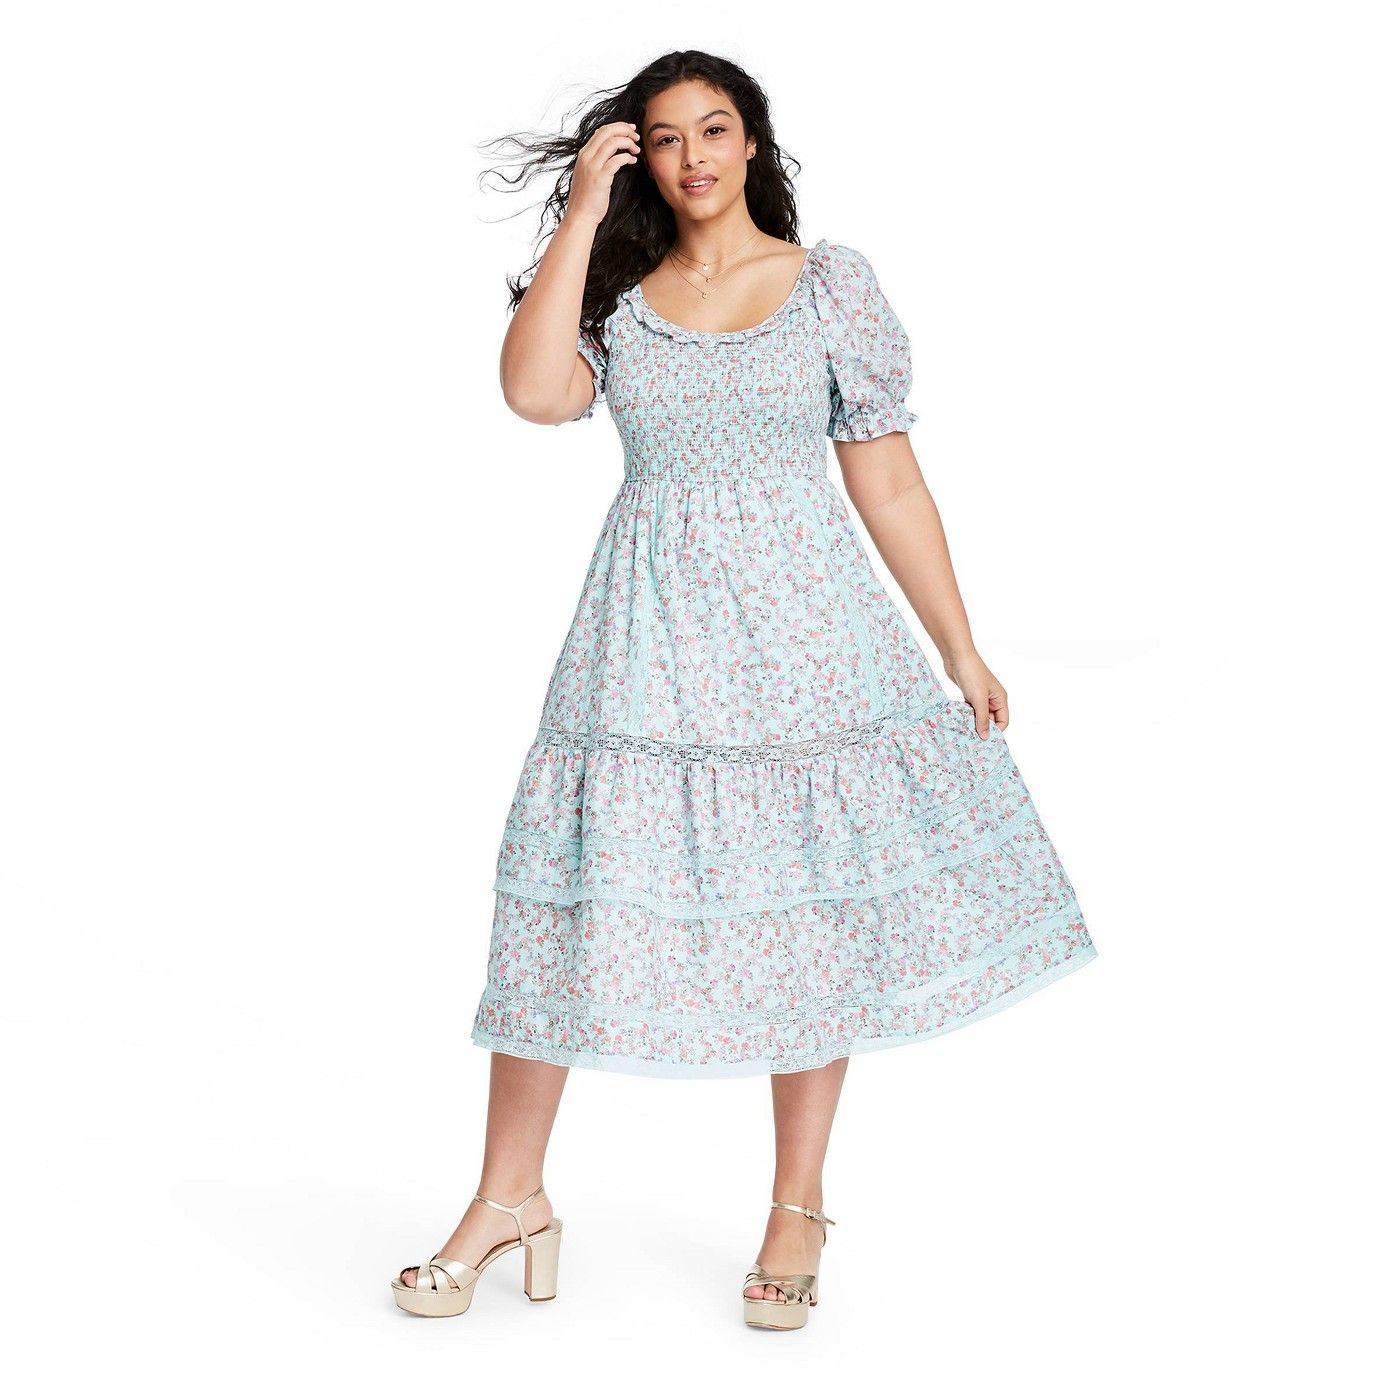 Women S Celeste Smocked Puff Sleeve Dress Loveshackfancy For Target Regular Plus Light Blue Sponsor Puffed Sleeves Dress Midi Dress With Sleeves Dresses [ 1400 x 1400 Pixel ]